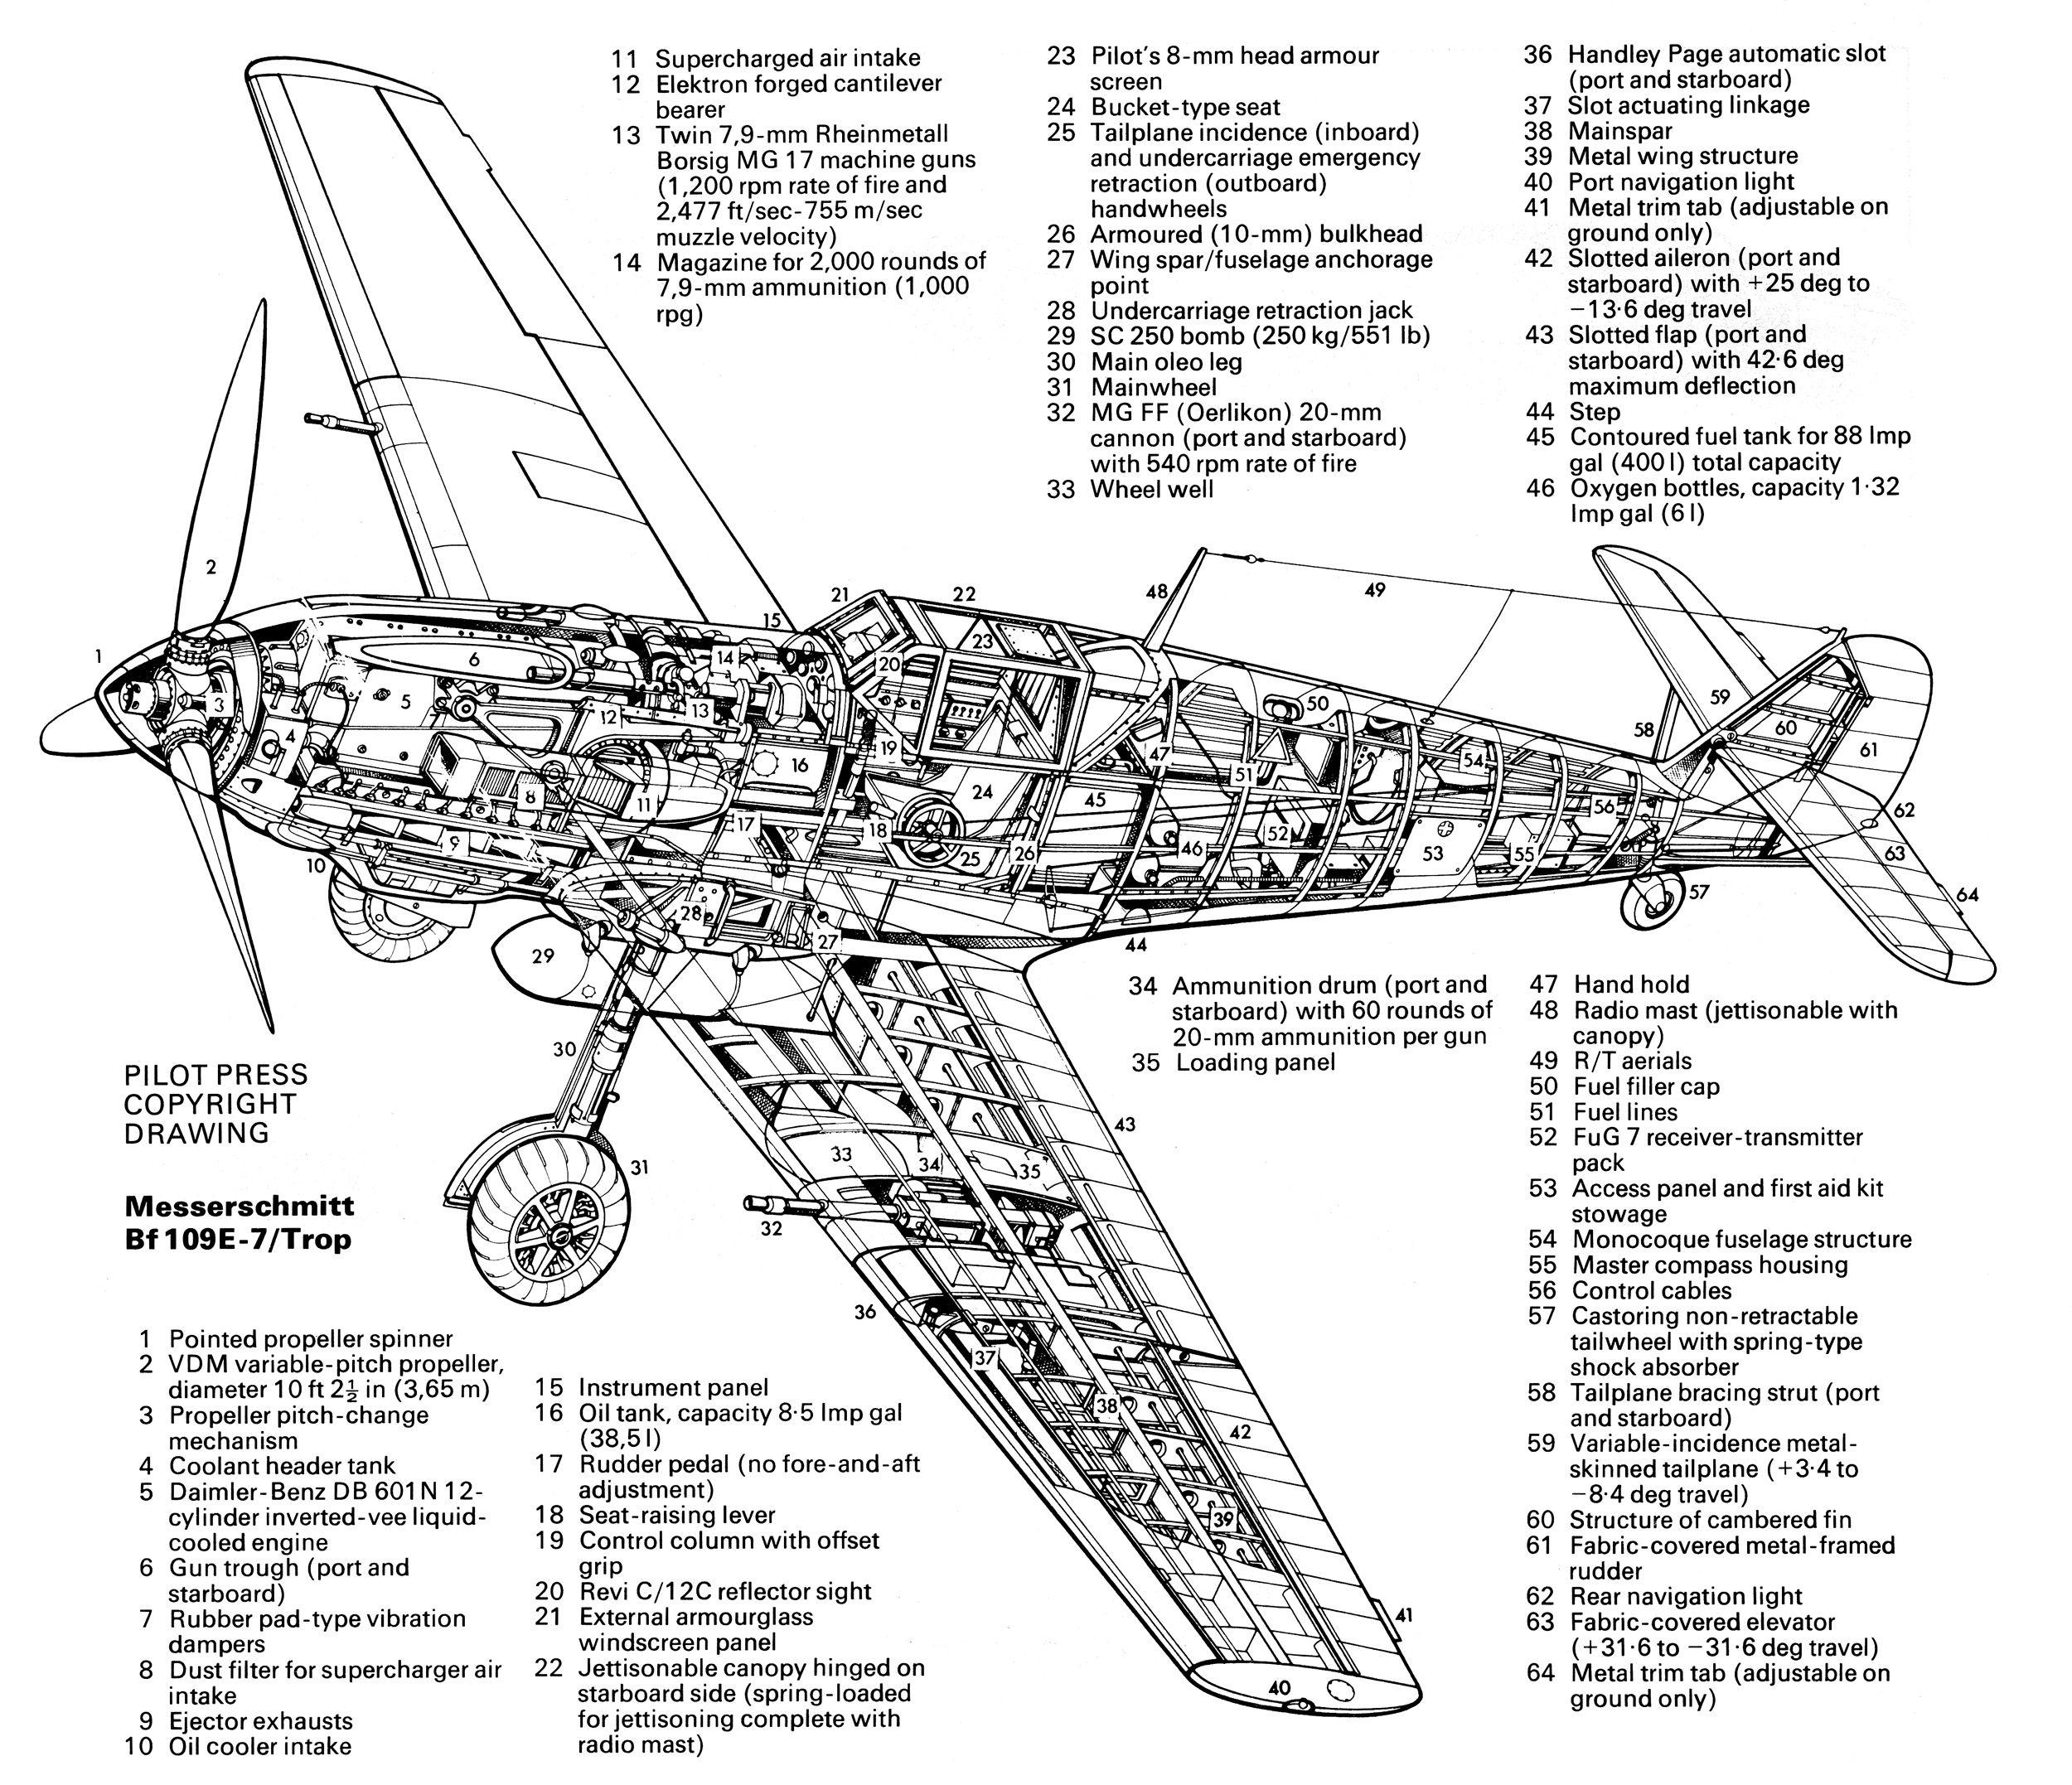 Pin En Aircraft Cutaways